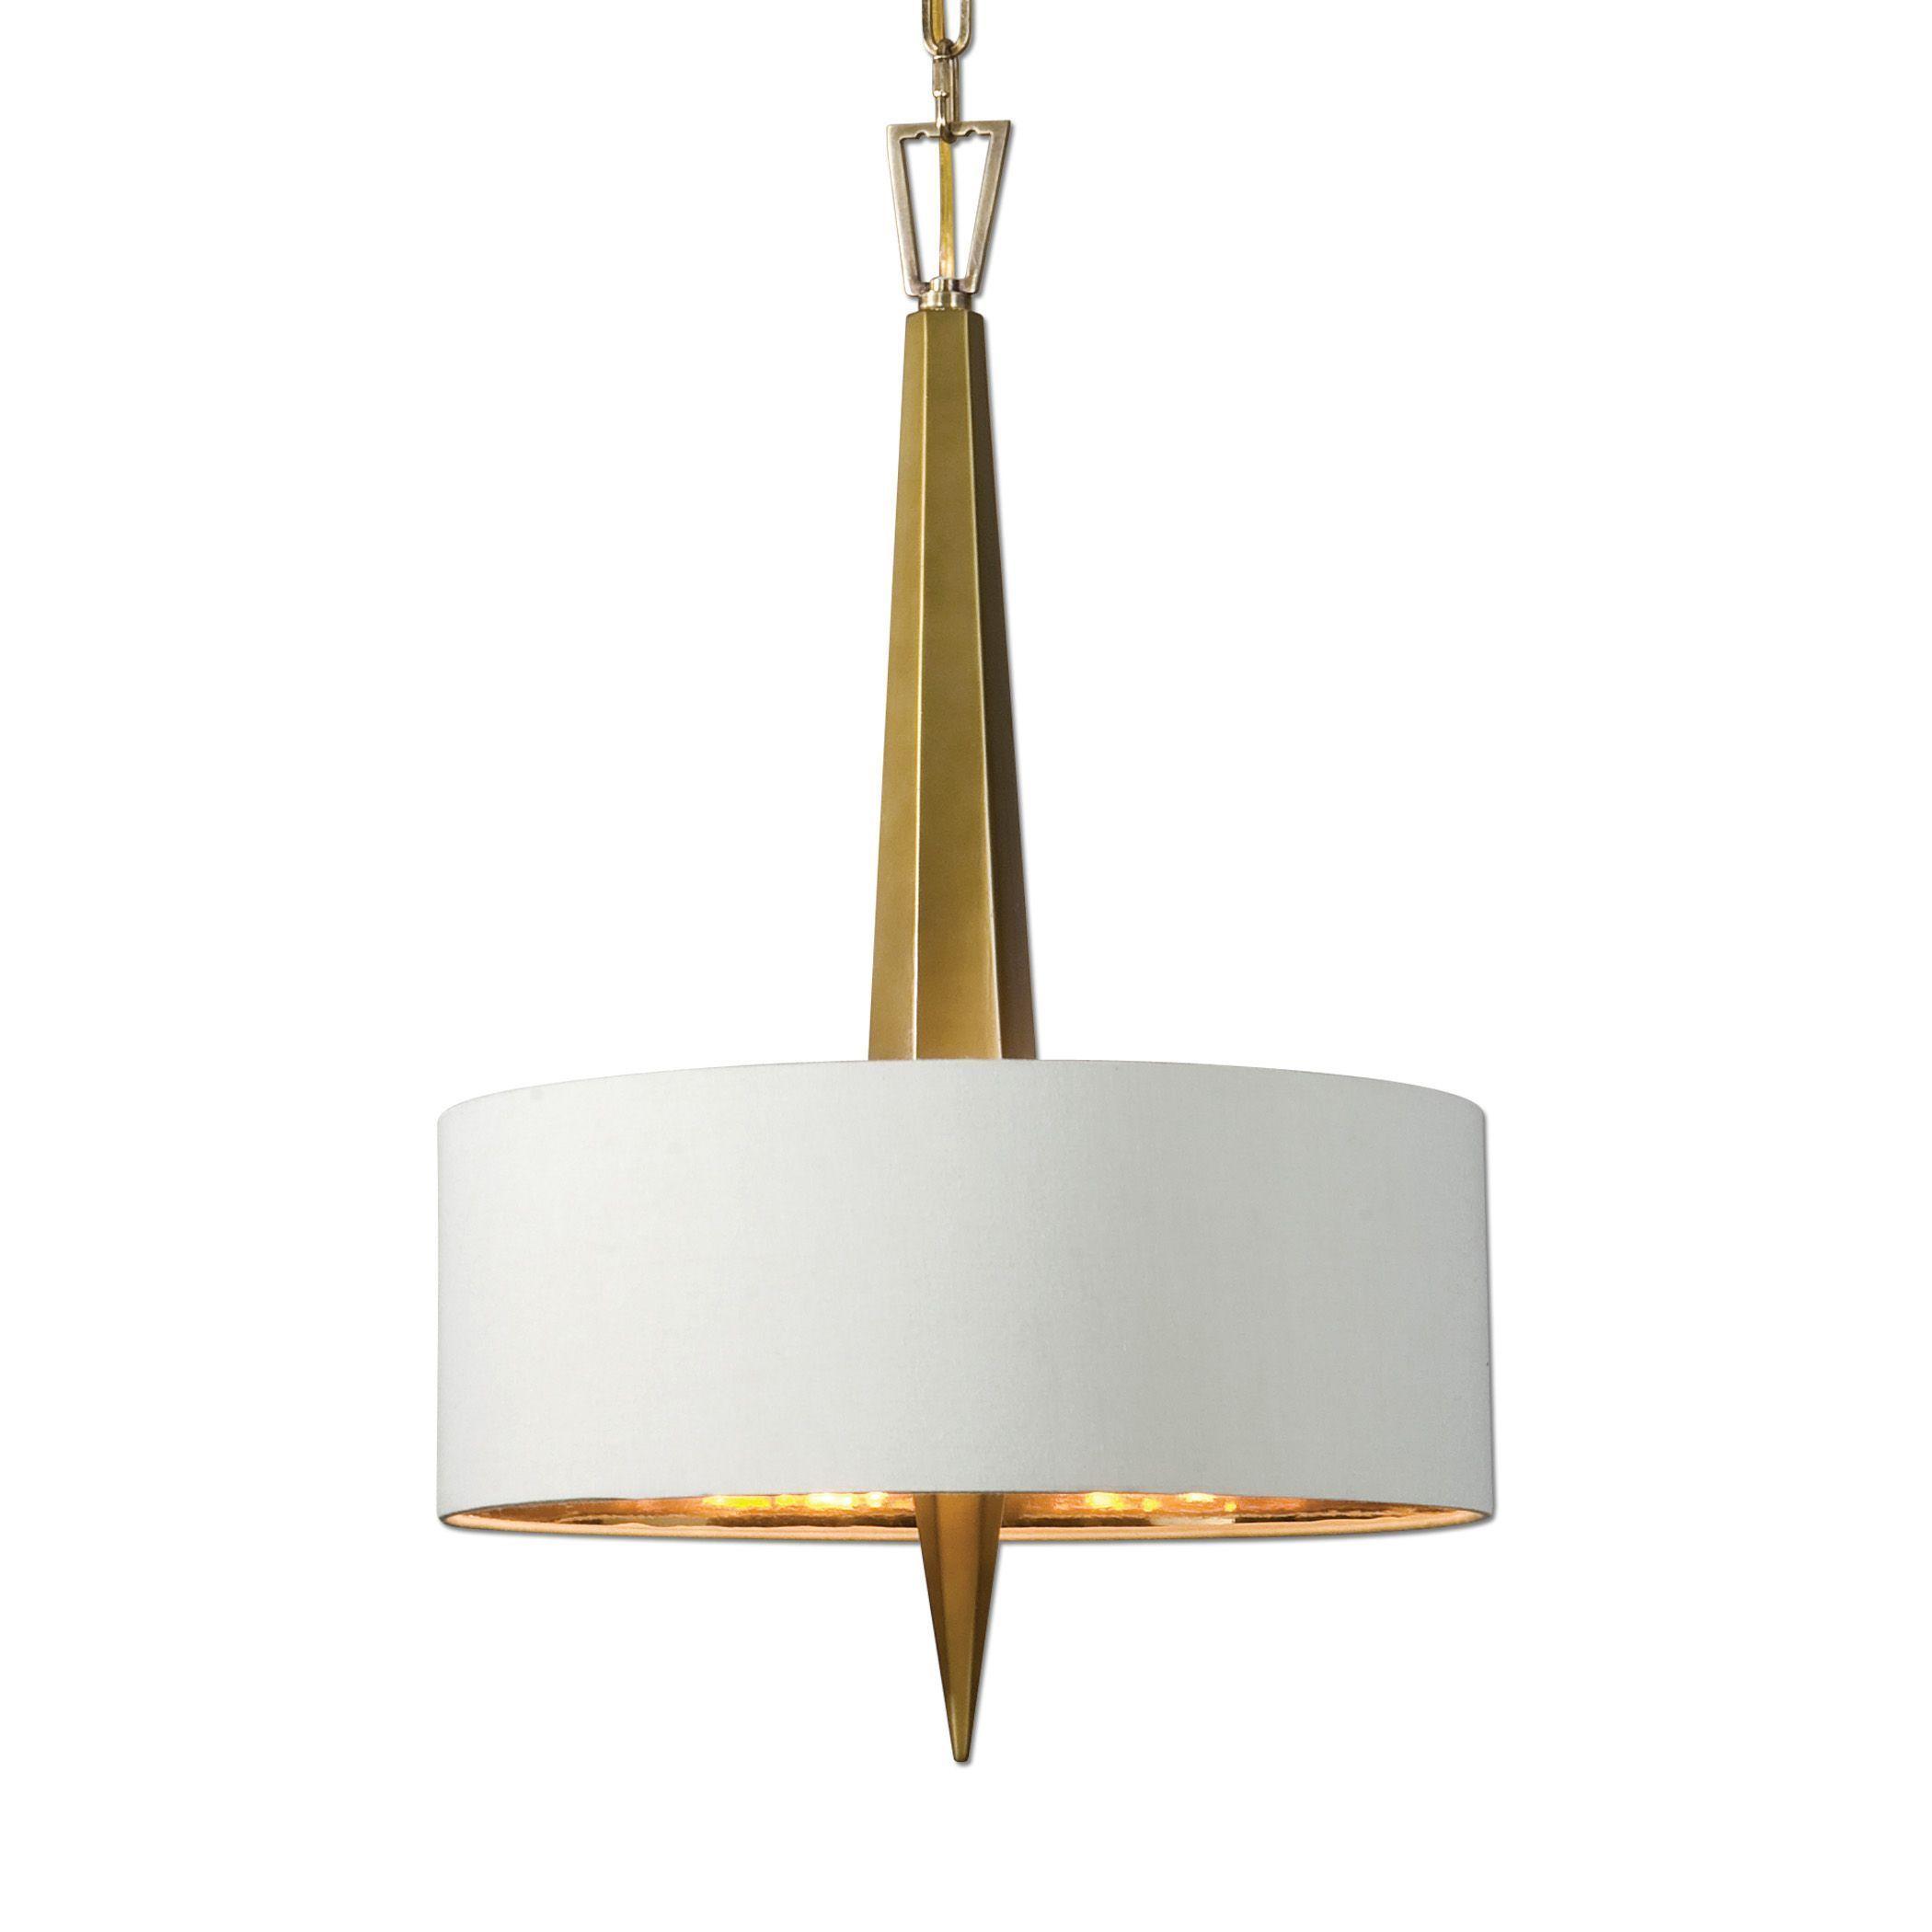 Uttermost obeliska 3 light gold chandelier lights ceramic uttermost obeliska 3 light gold chandelier lights ceramic arubaitofo Image collections